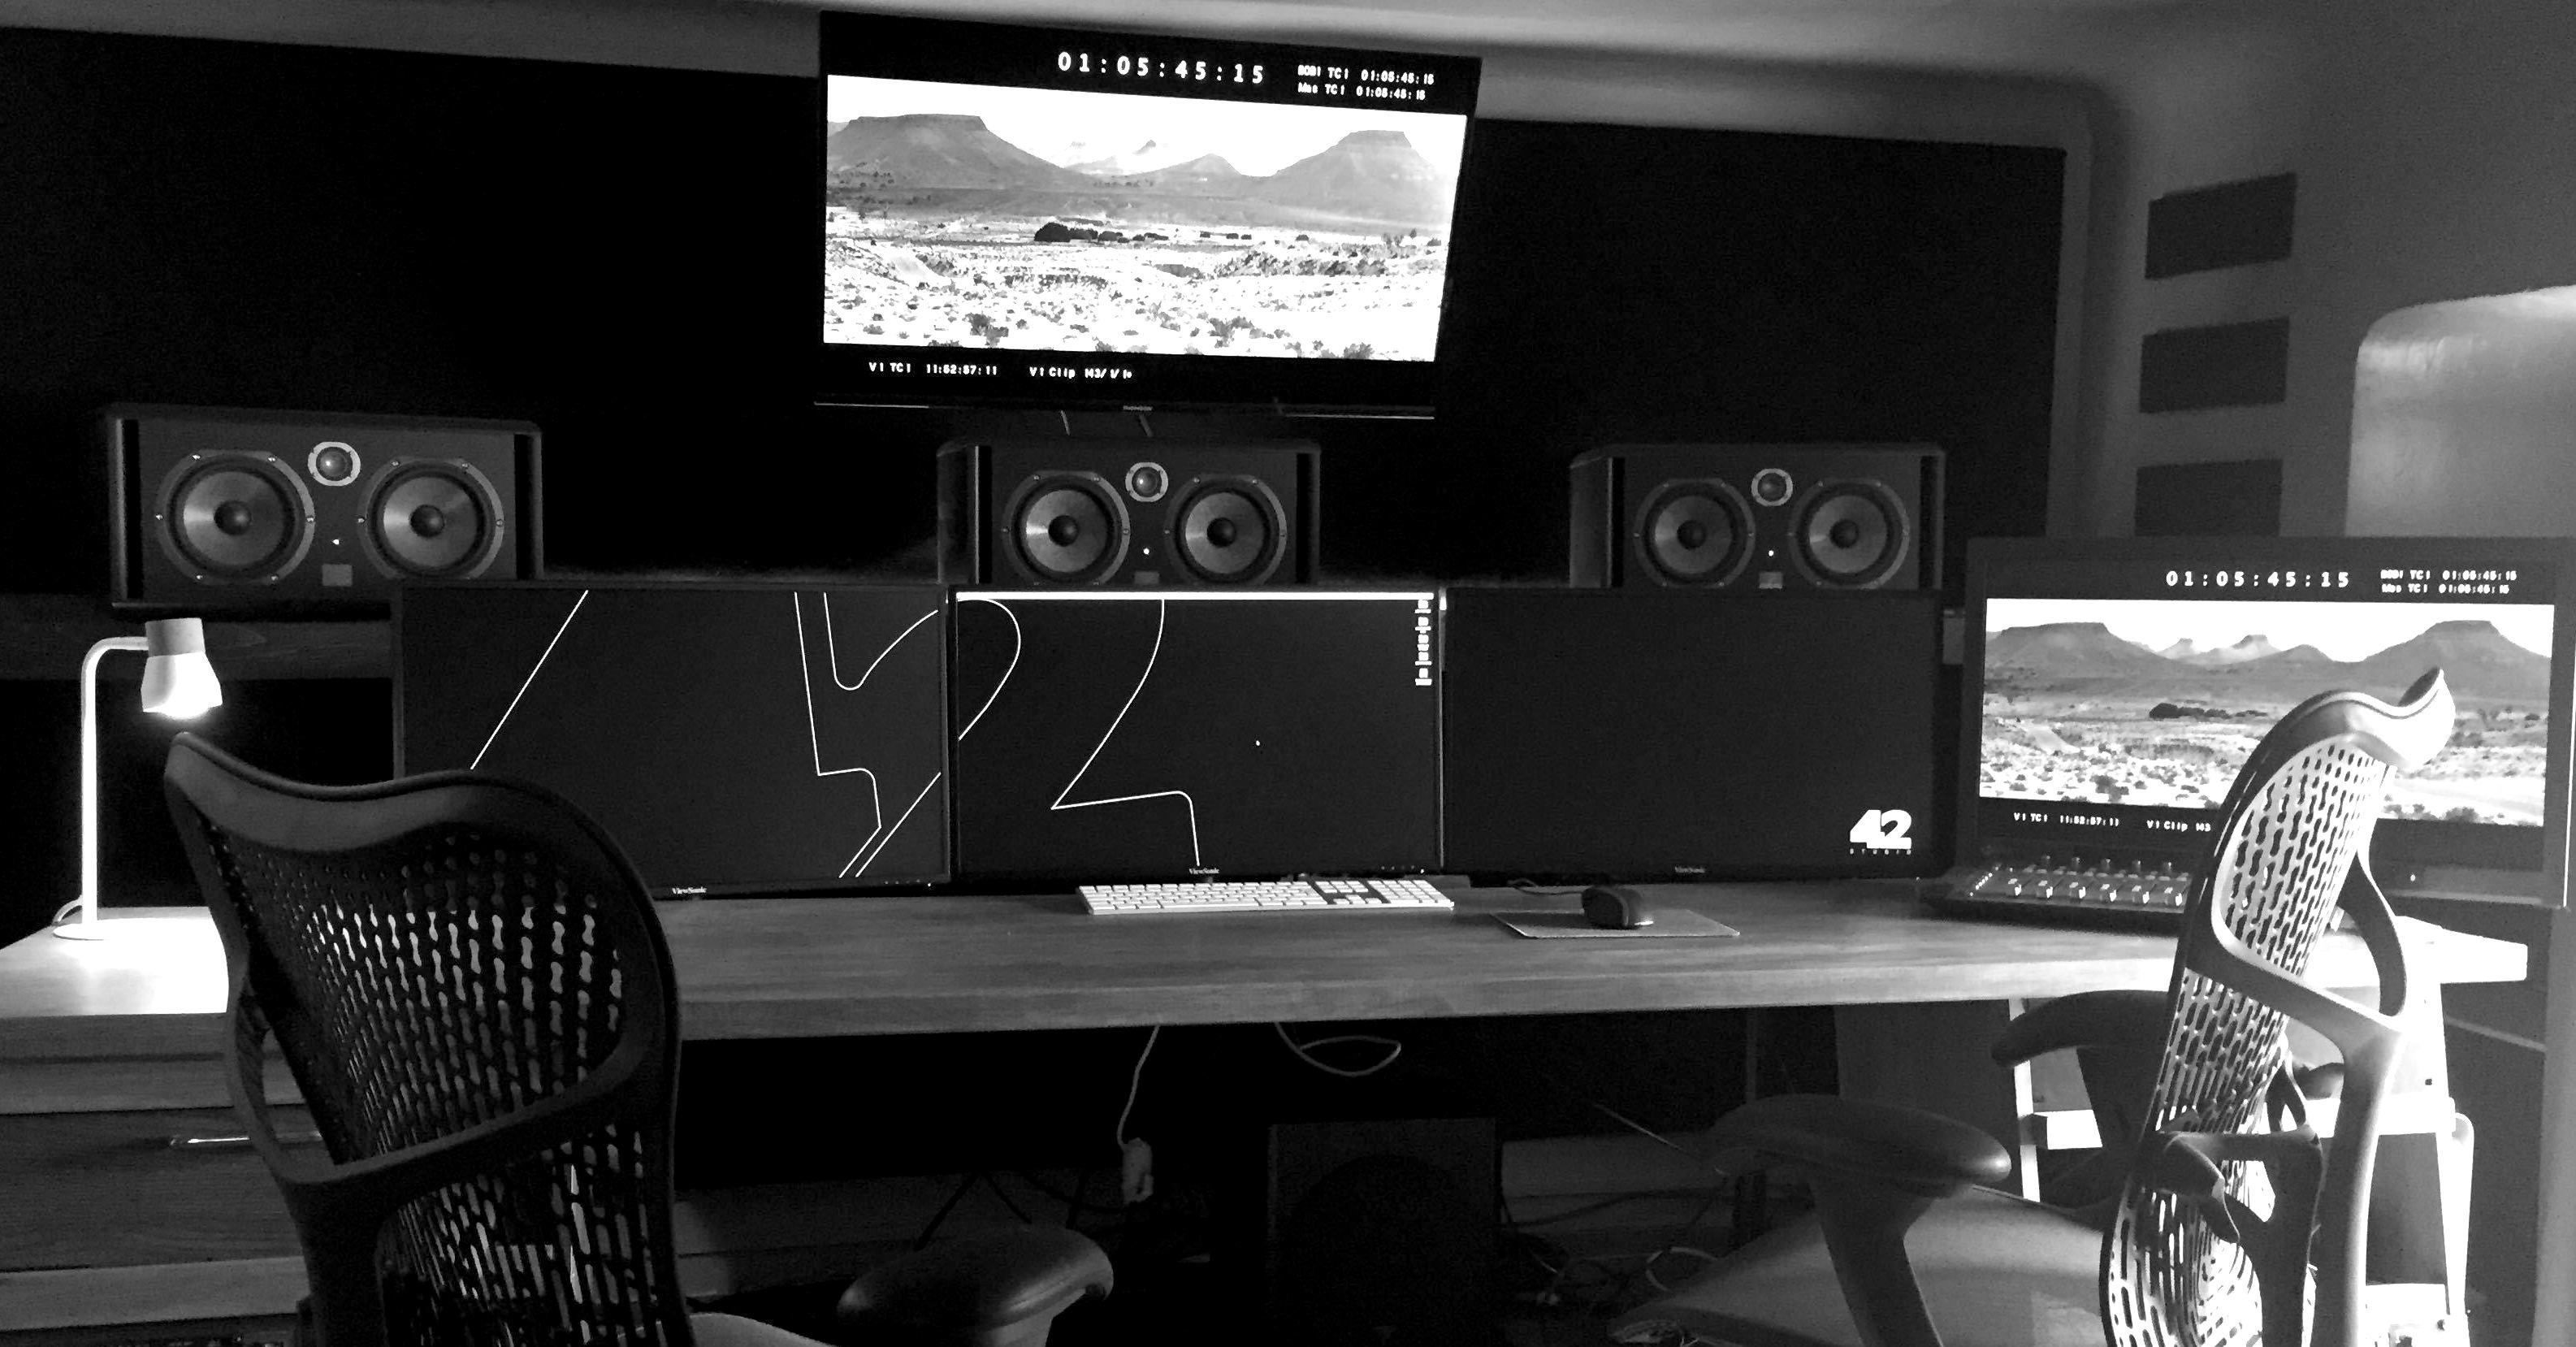 salle de montage son et sound design marseille